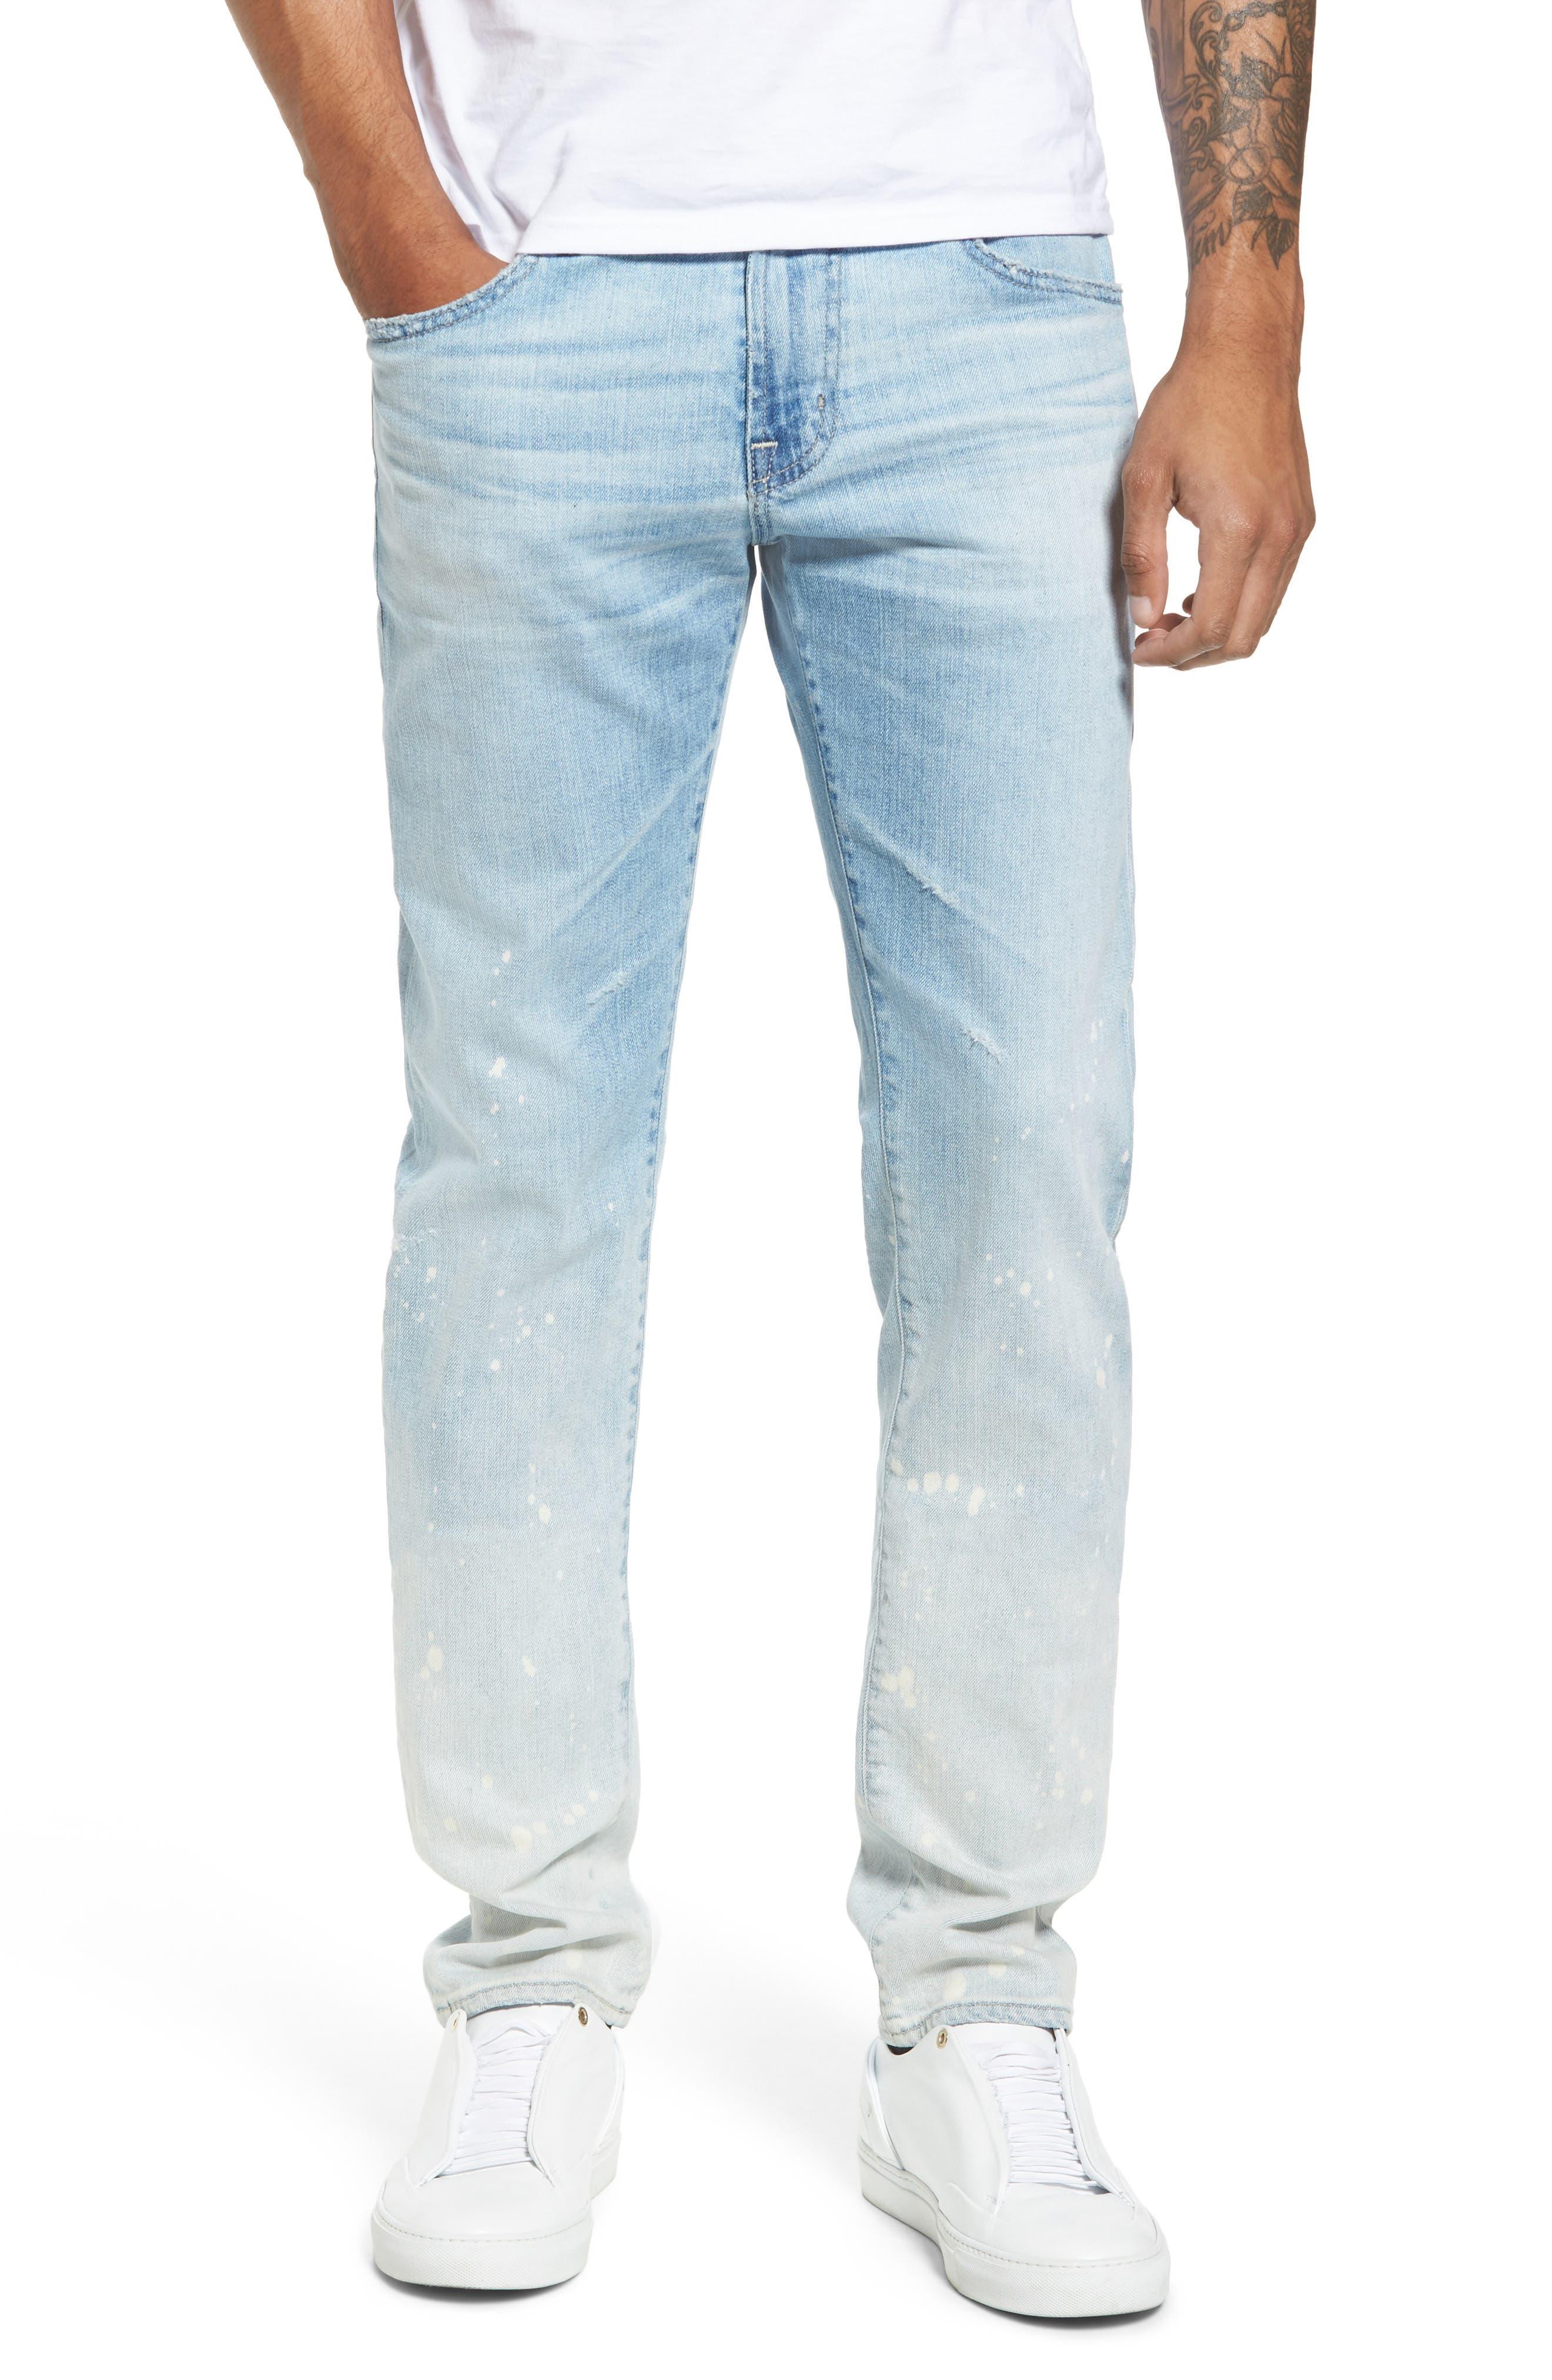 Dylan Slim Skinny Fit Jeans,                         Main,                         color, 23 Years Oceanside